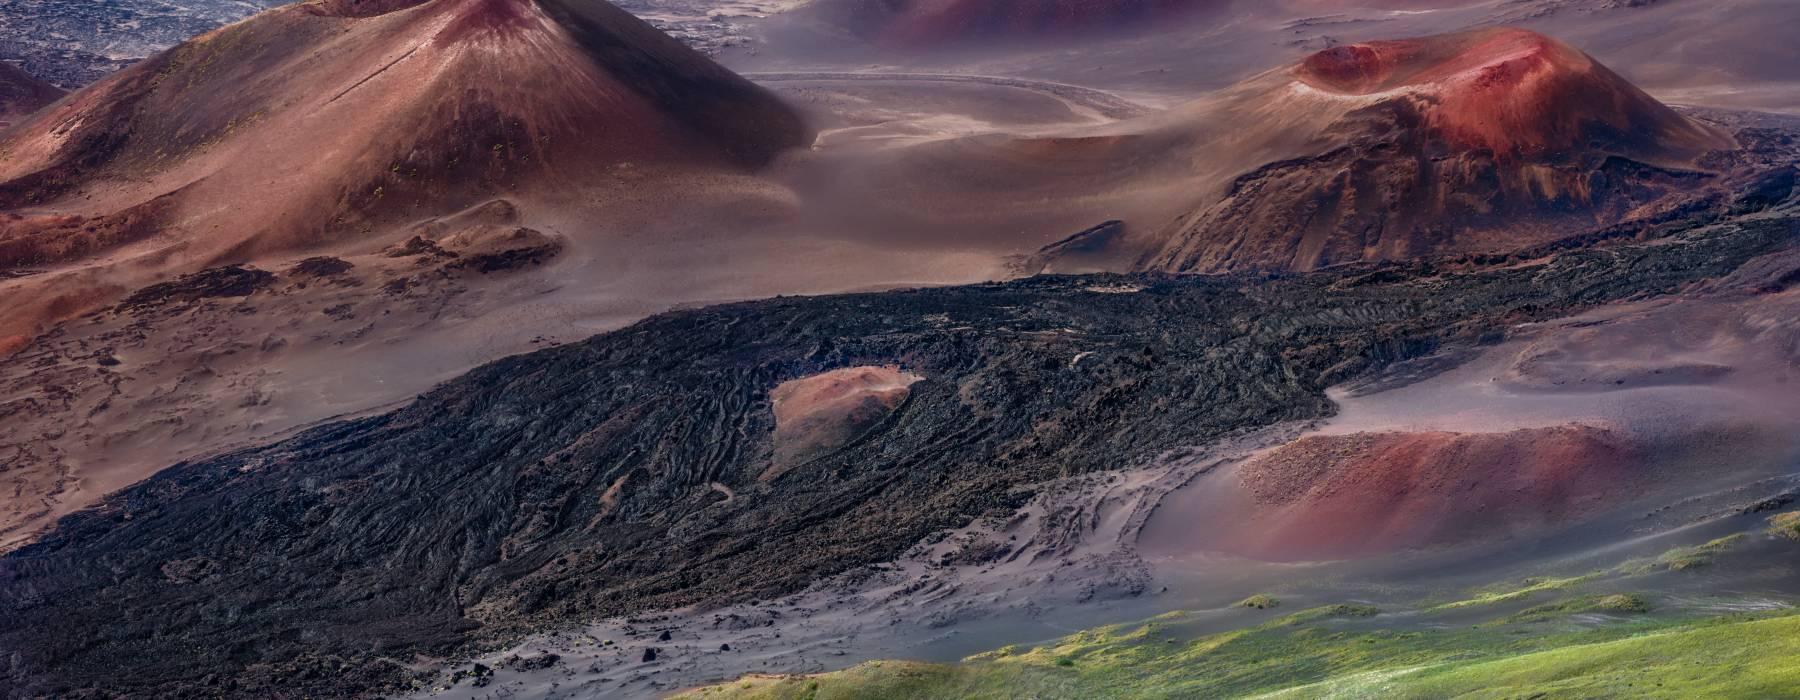 Maui Hawaii Haleakala Crater